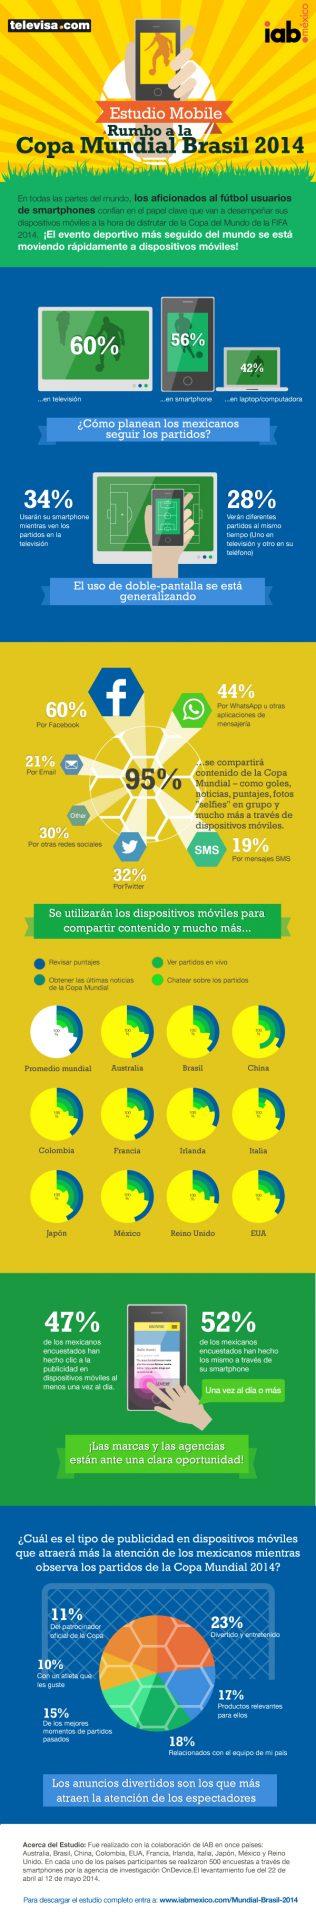 IMAGEN.IAB-football-infographic-5-2014-s4